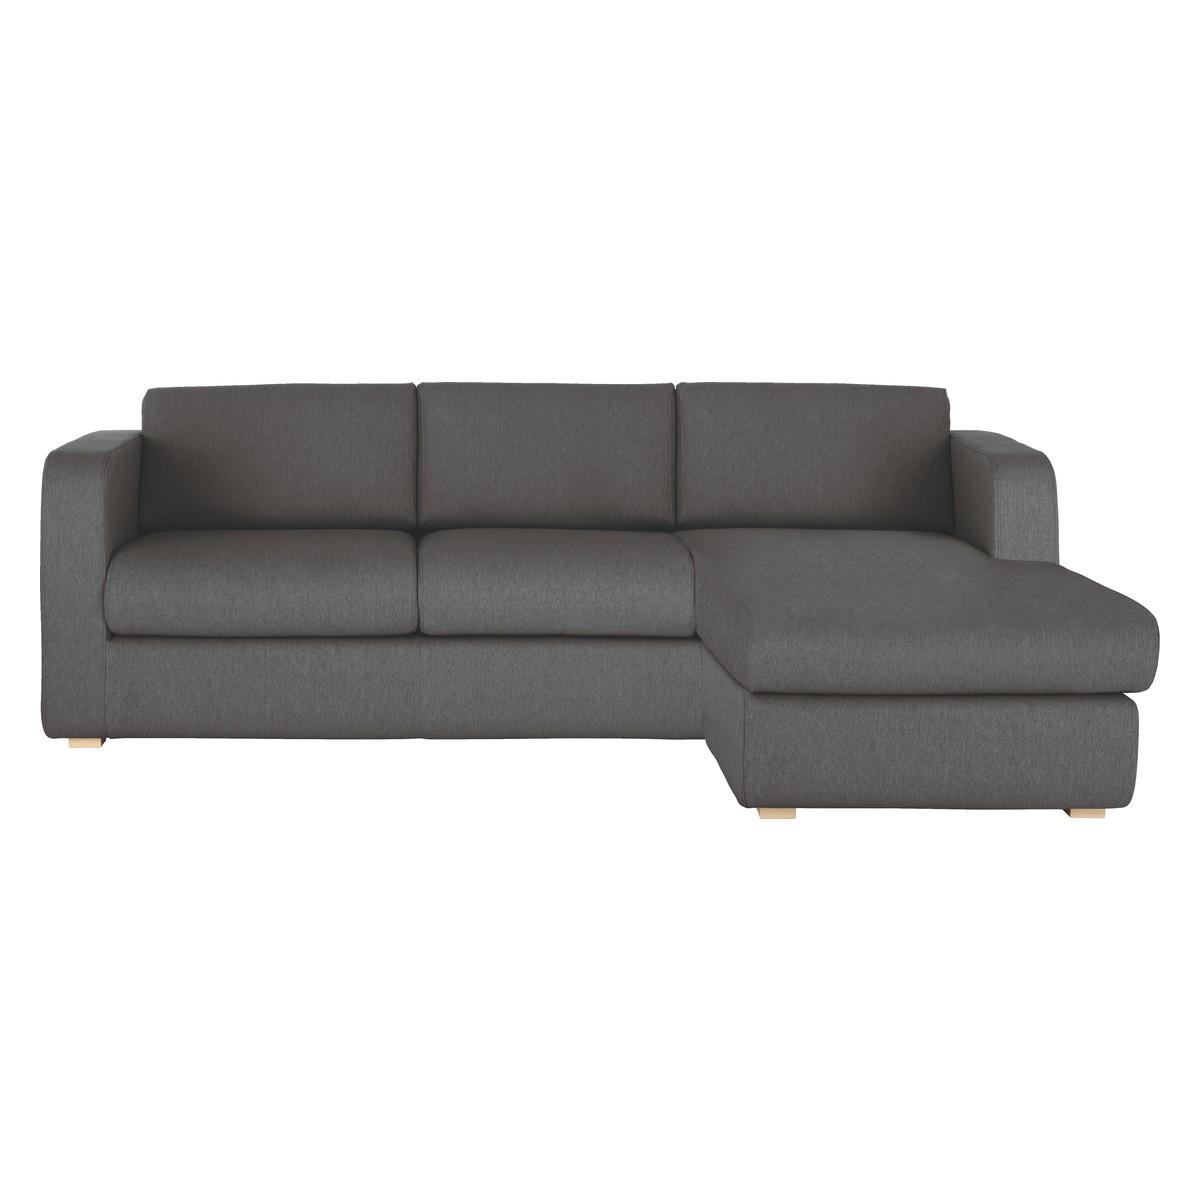 small corner sofa corner sofas; leather u0026 fabric l-shaped styles - habitat BMSHLRO